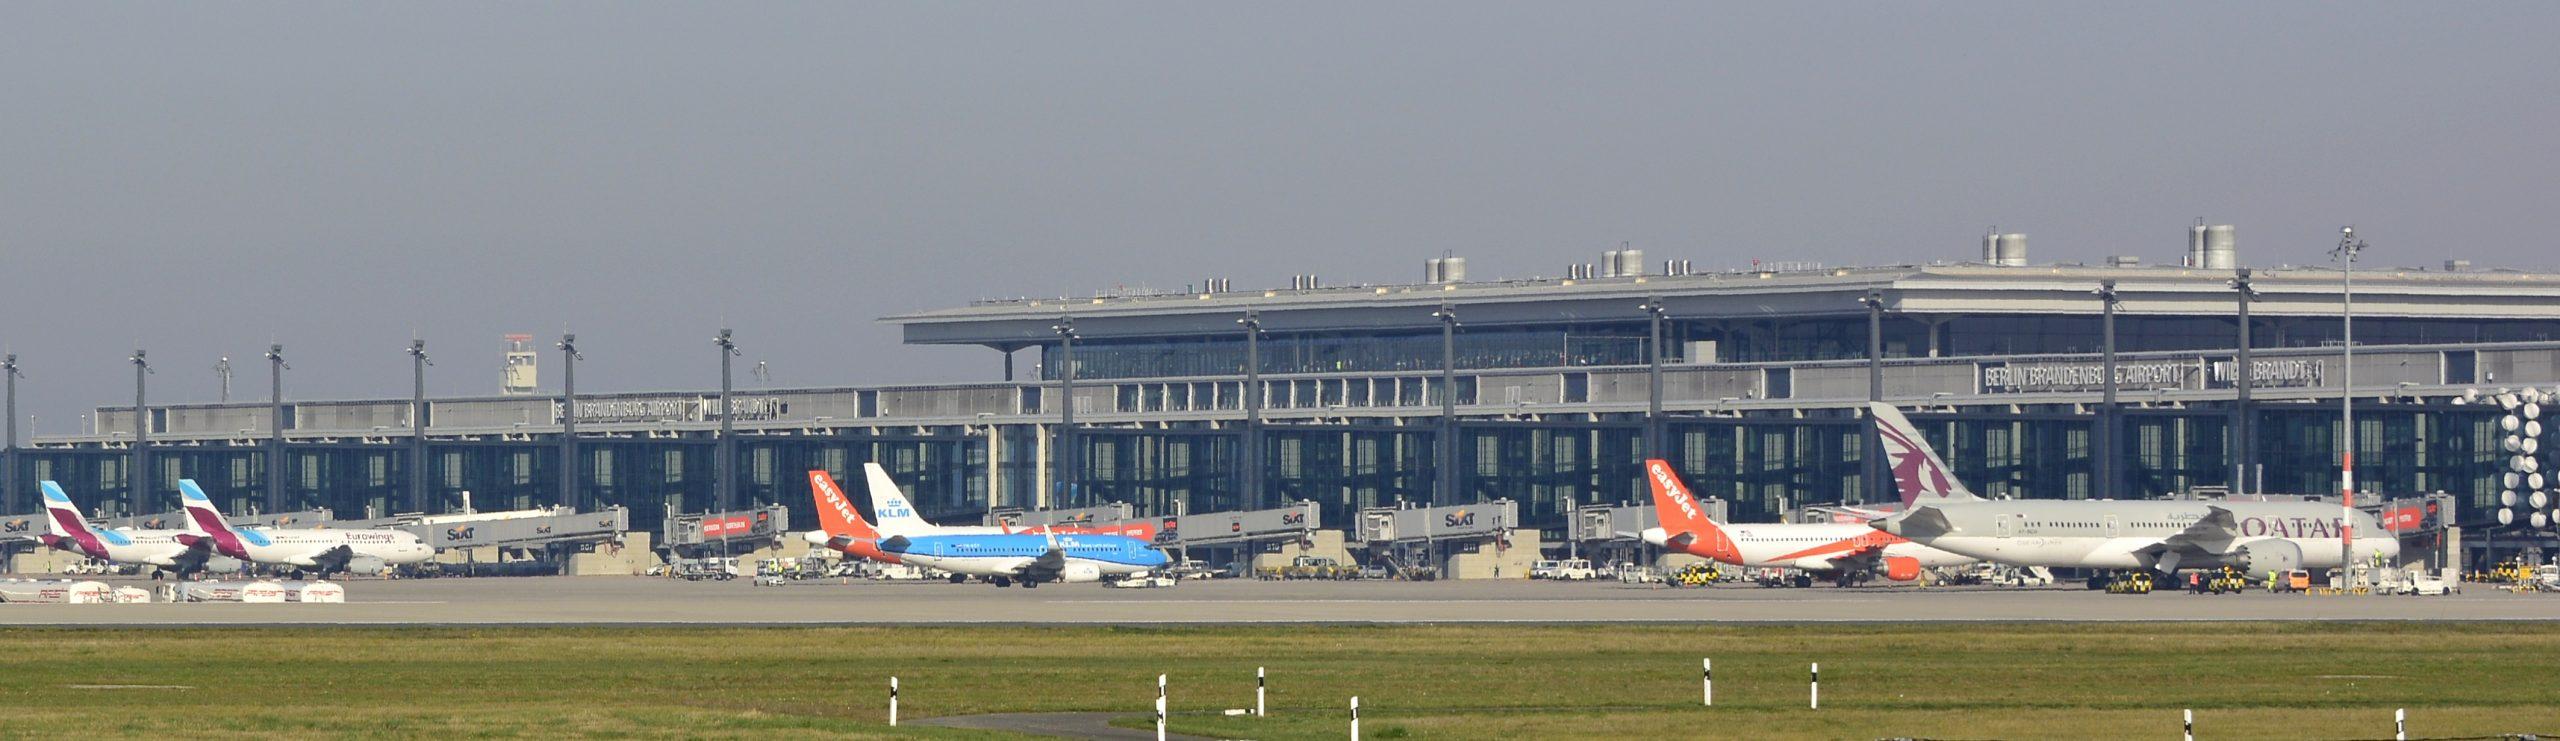 "Volga-Dnepr Cargo / Antonov AN-124 ""Ruslan"" / RA-82045 / Berlin-Schönefeld / 16.09.2015"